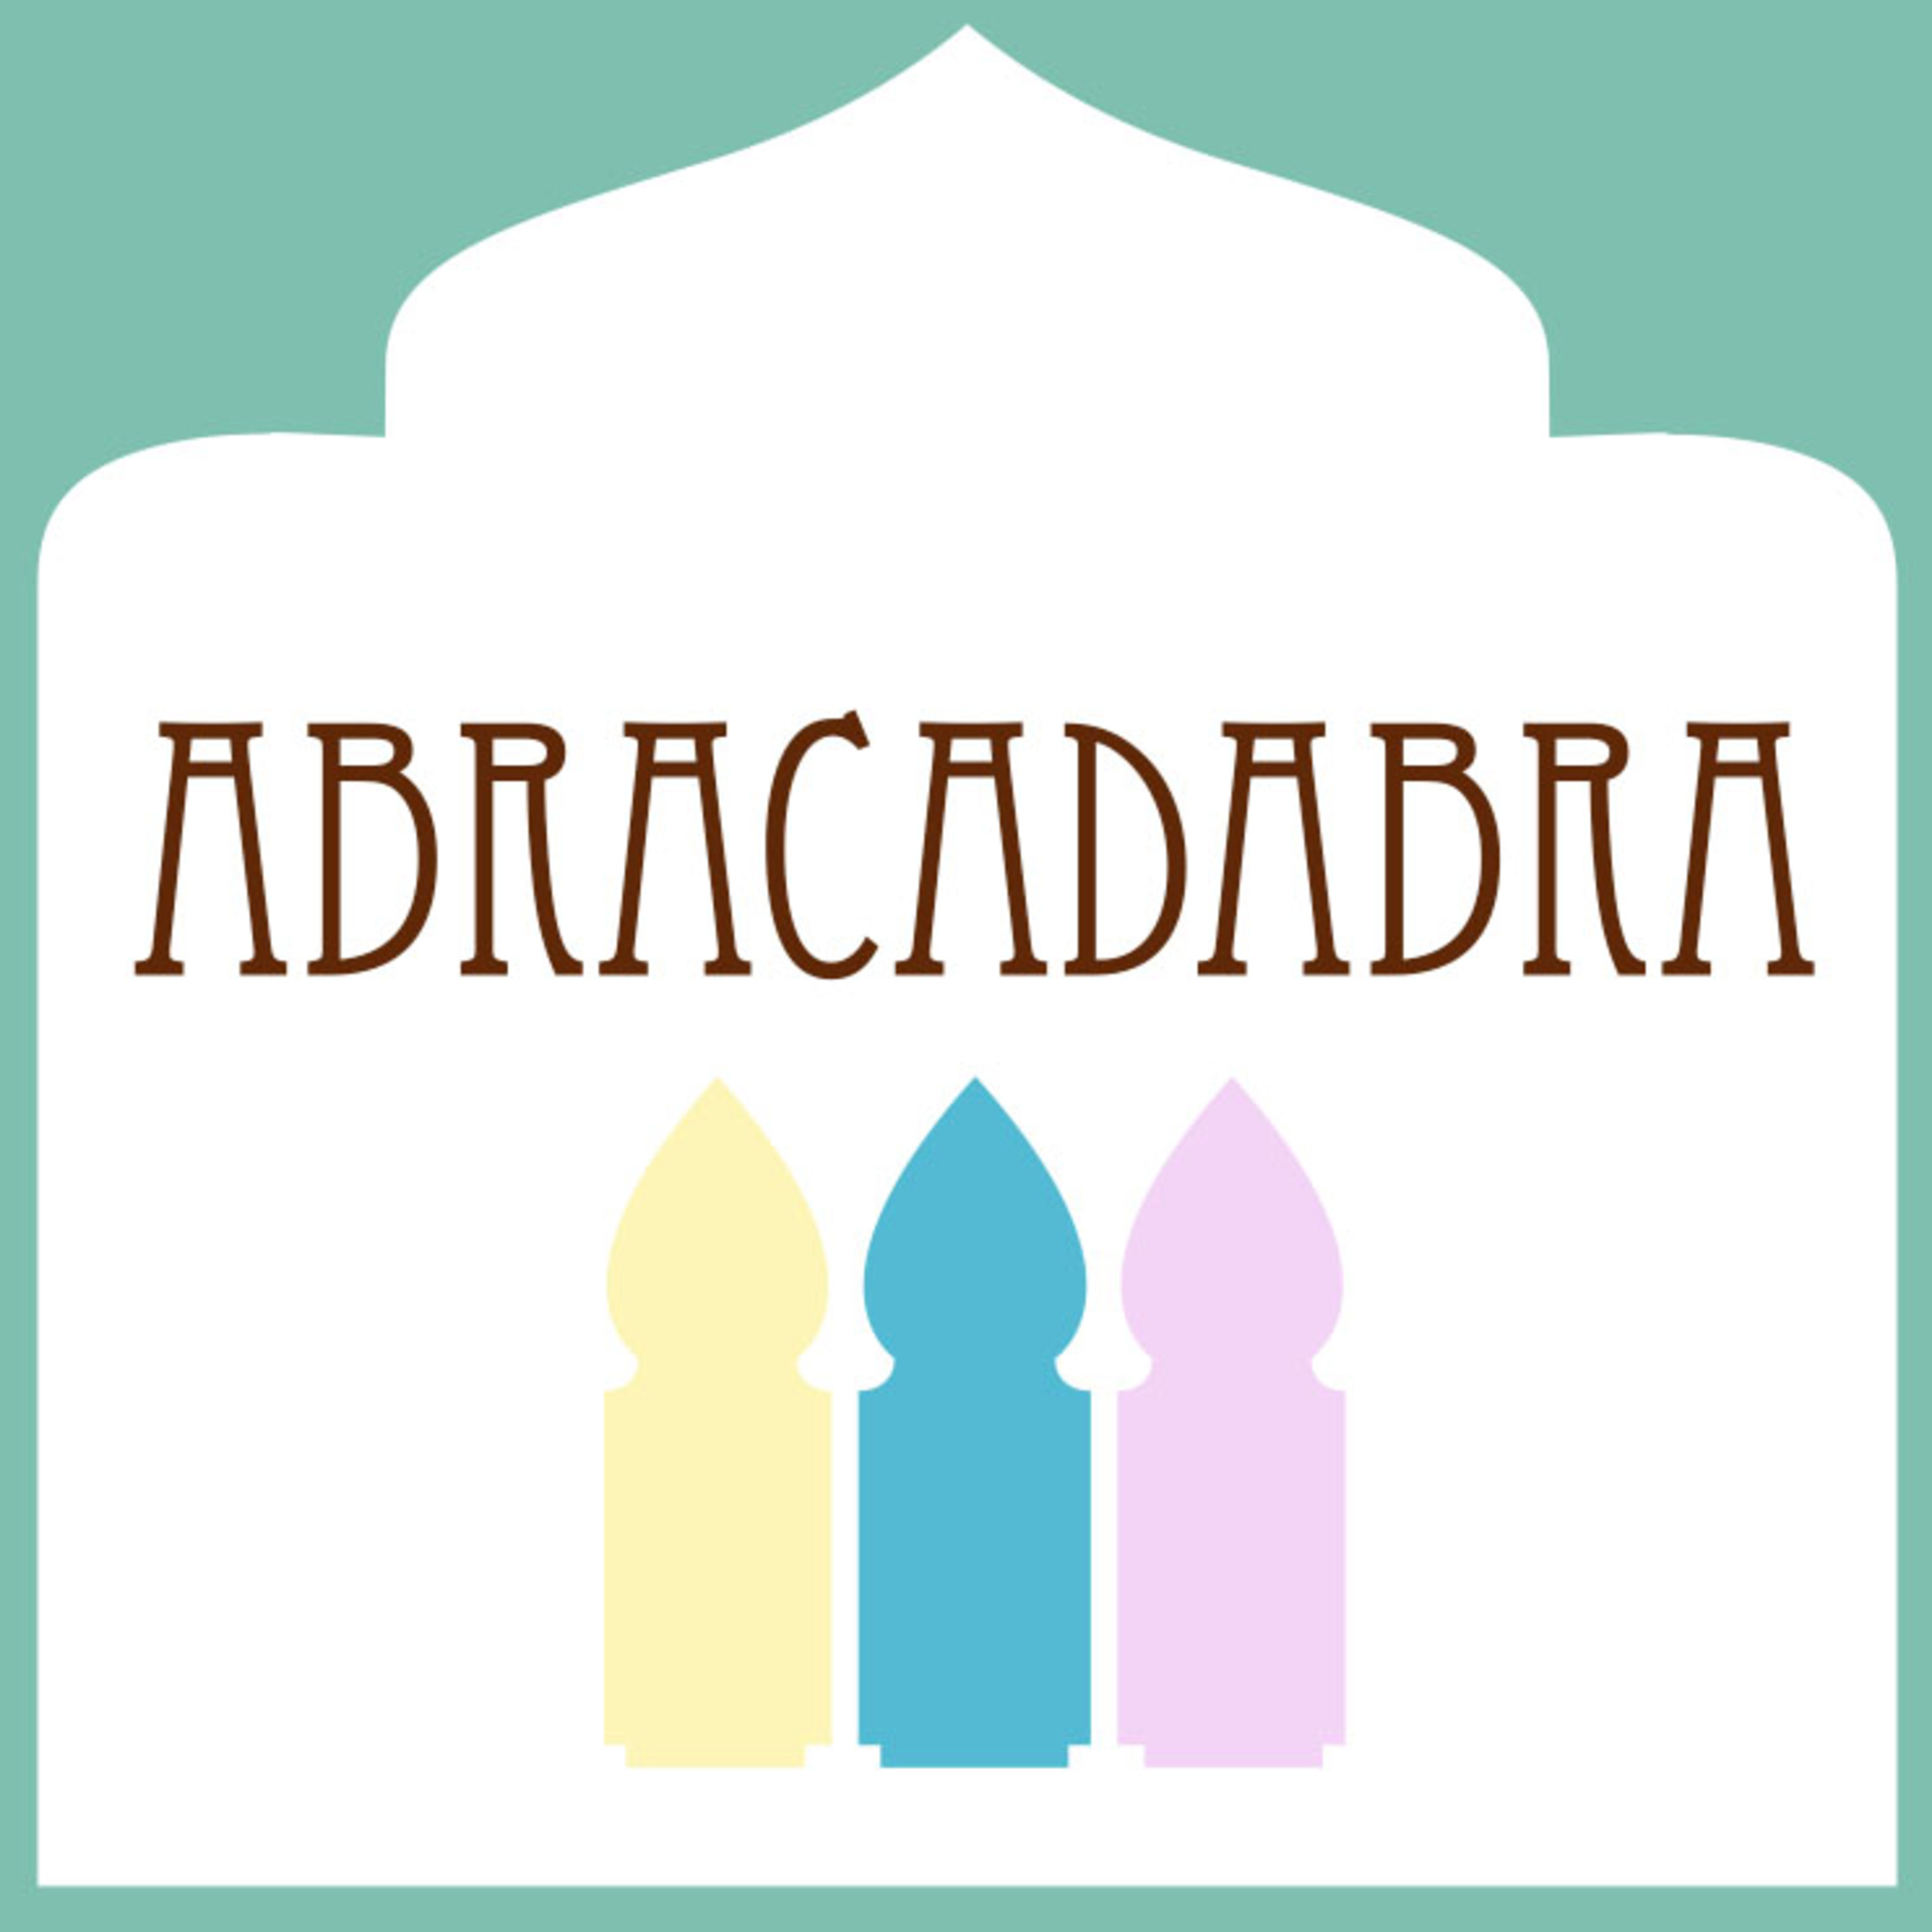 abracadabra- company logo